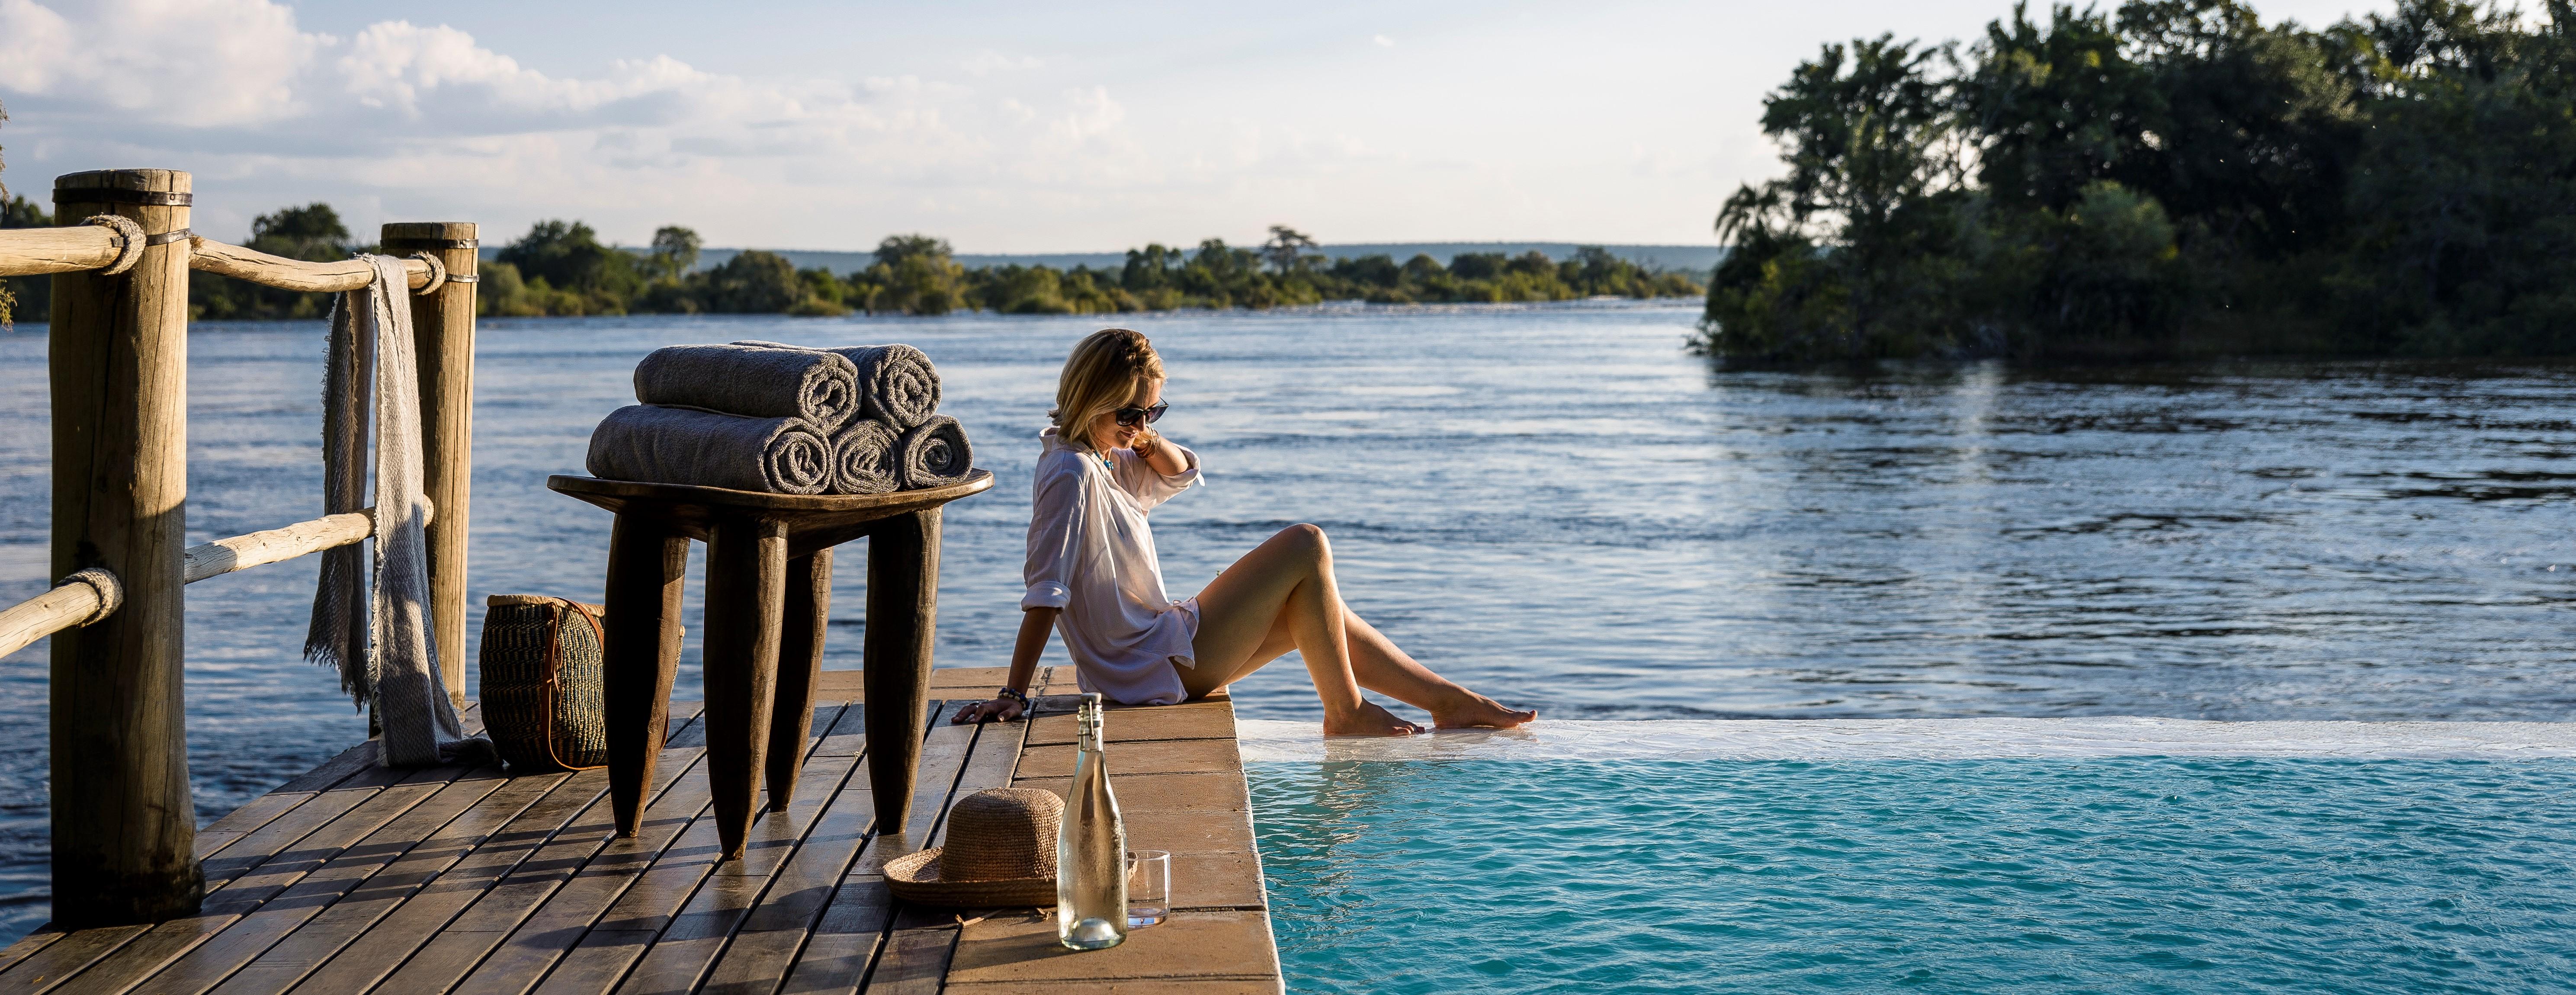 sanctuary-sussi-and-chuma-zambia